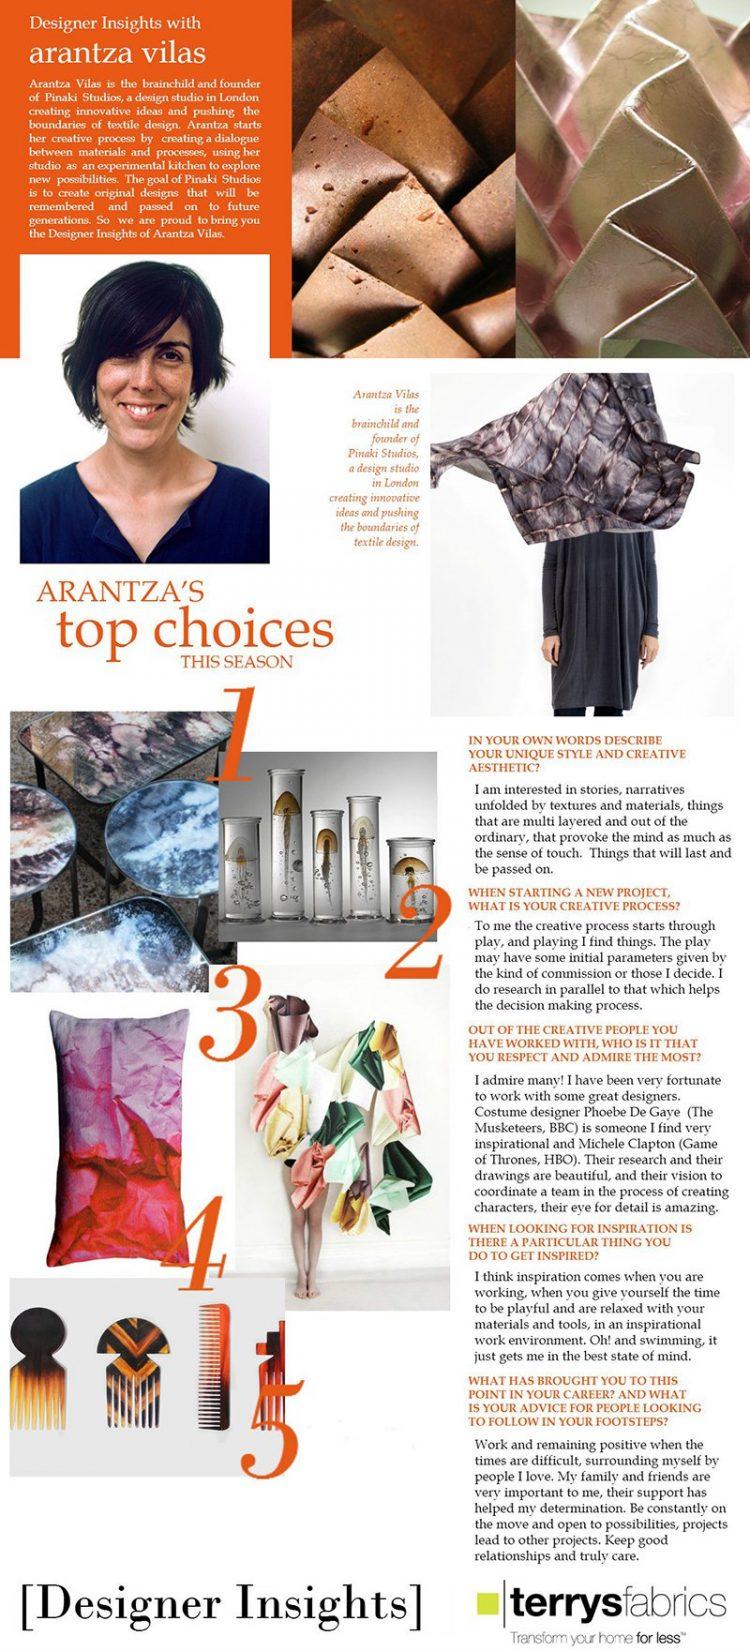 Terry's Fabrics – Designer Insights with Arantza Vilas